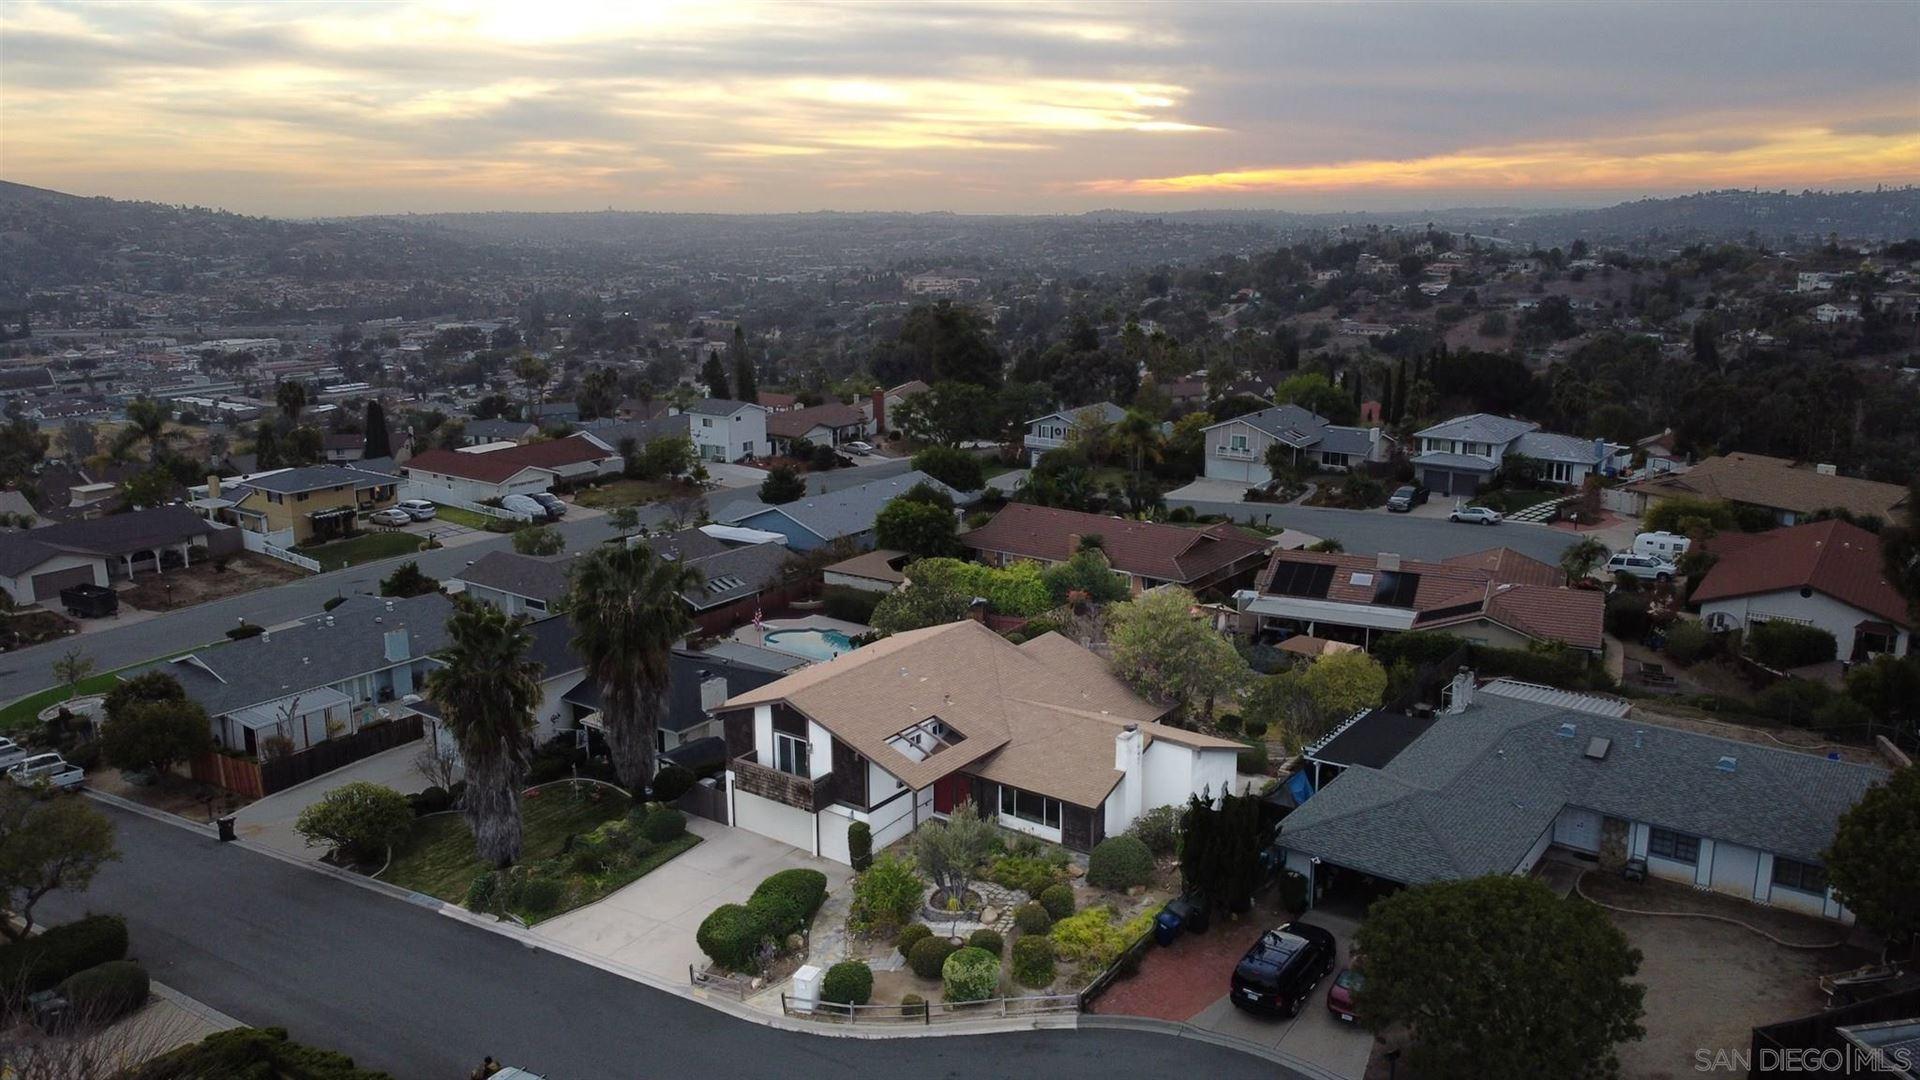 Photo of 4326 Morning View Ct, La Mesa, CA 91941 (MLS # 210000459)